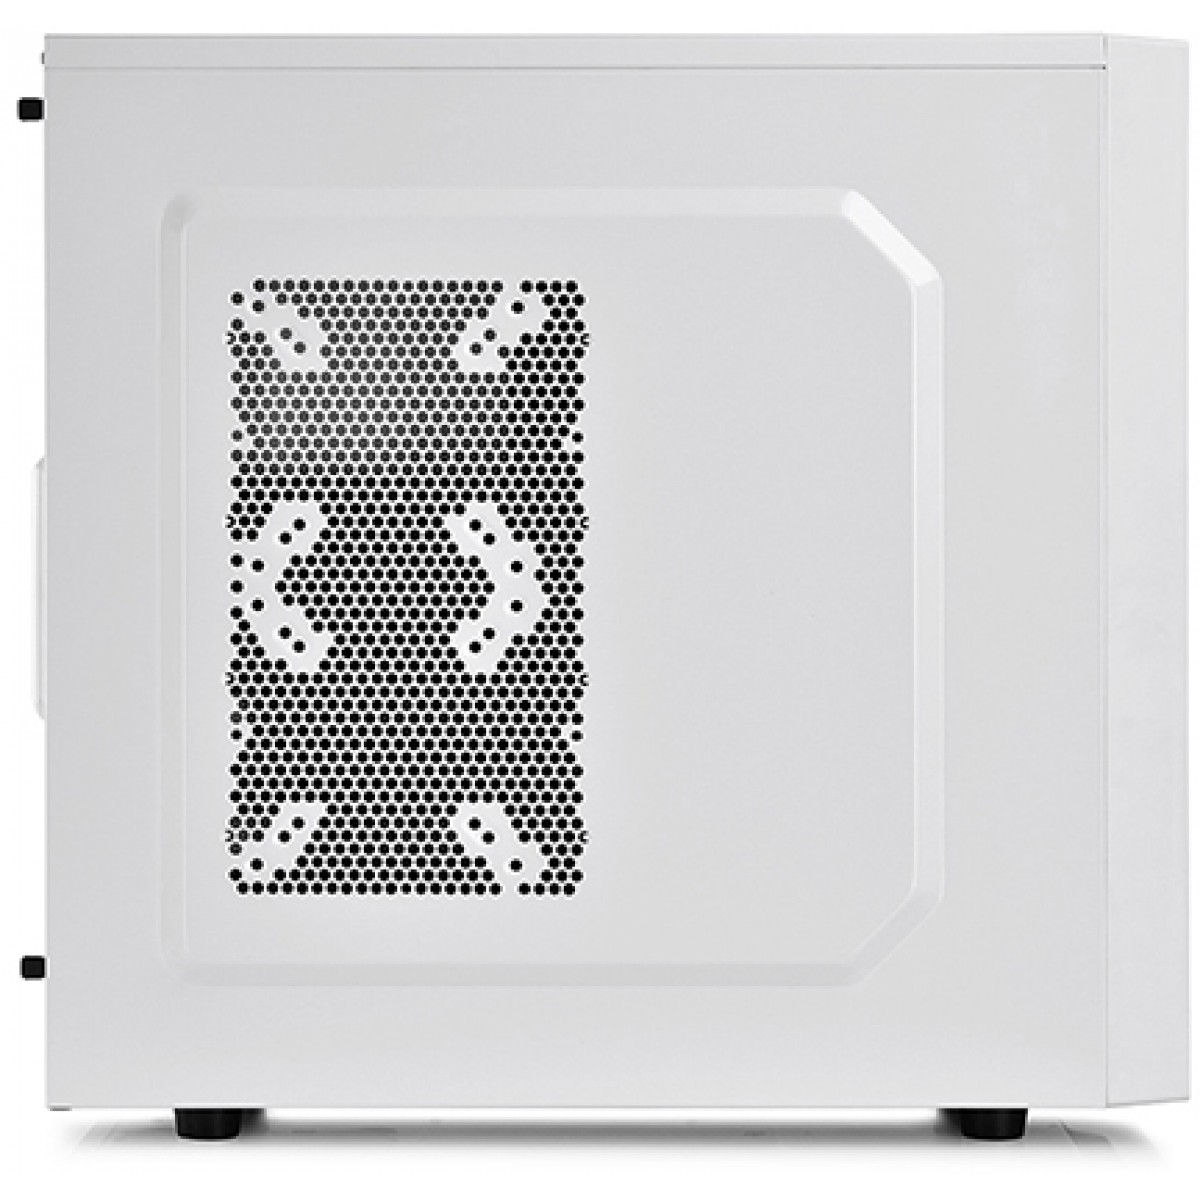 Gabinete Gamer DeepCool Tesseract WH, Mid Tower, Com 1 Fan, White, Sem Fonte, DP-CCATX-TSRWHBF